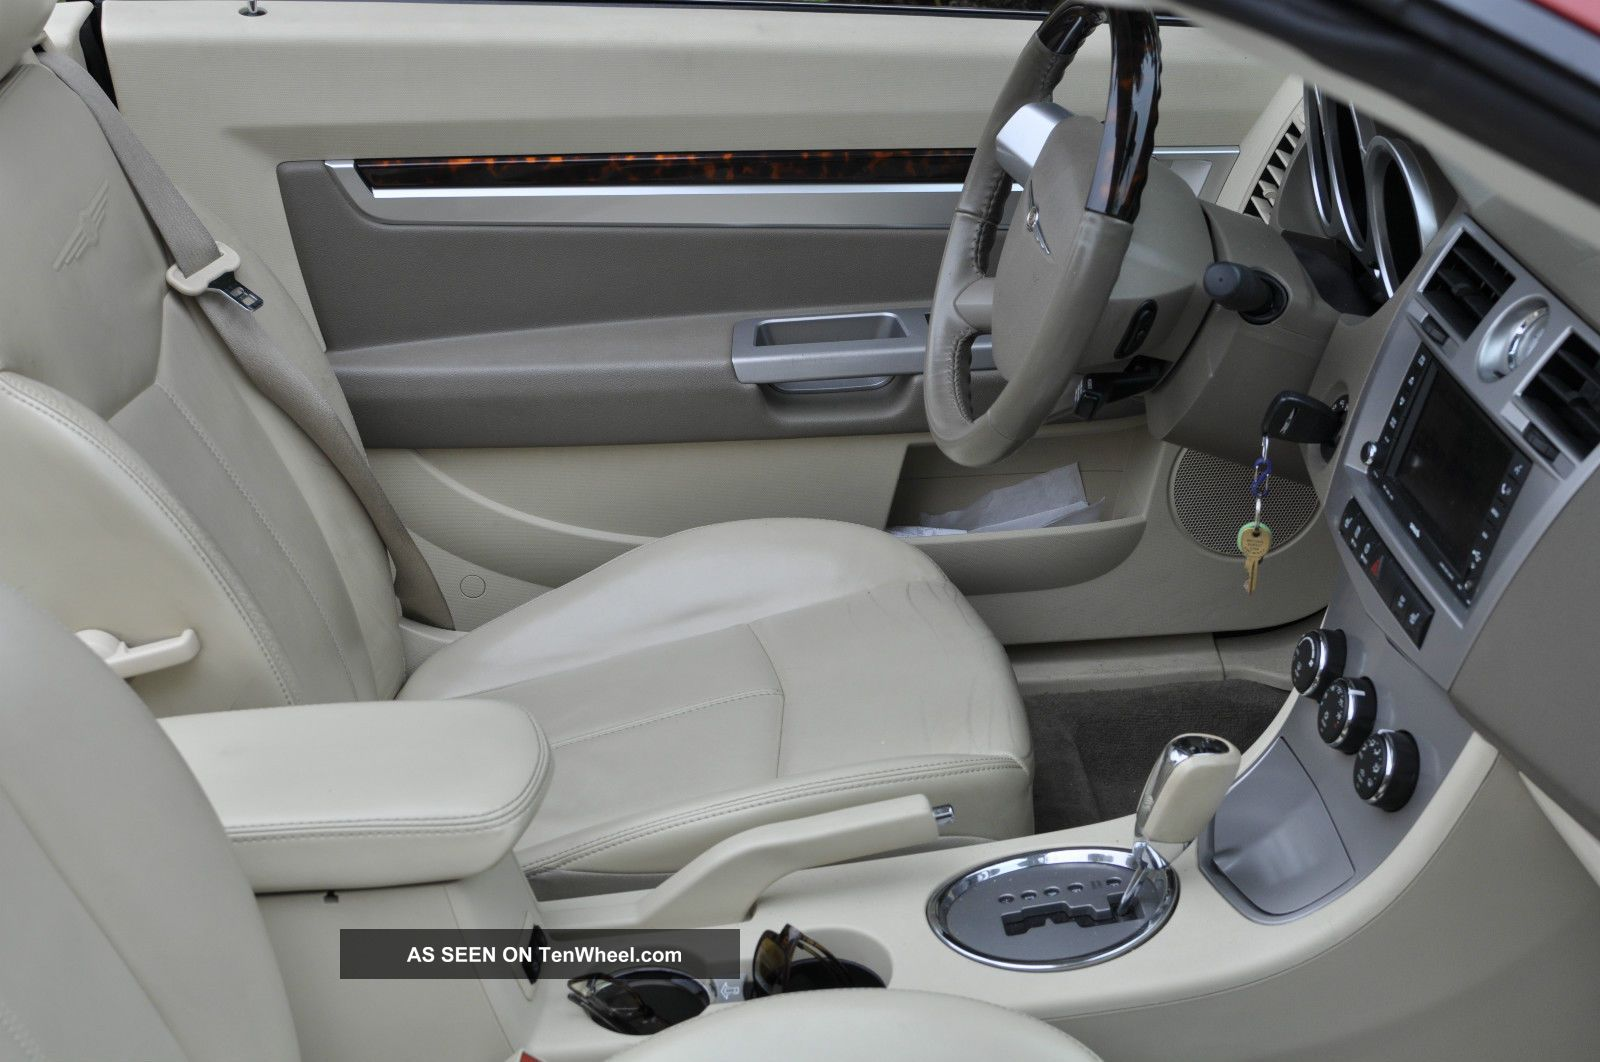 2008 Chrysler Sebring Limited Hard Top Convertiable